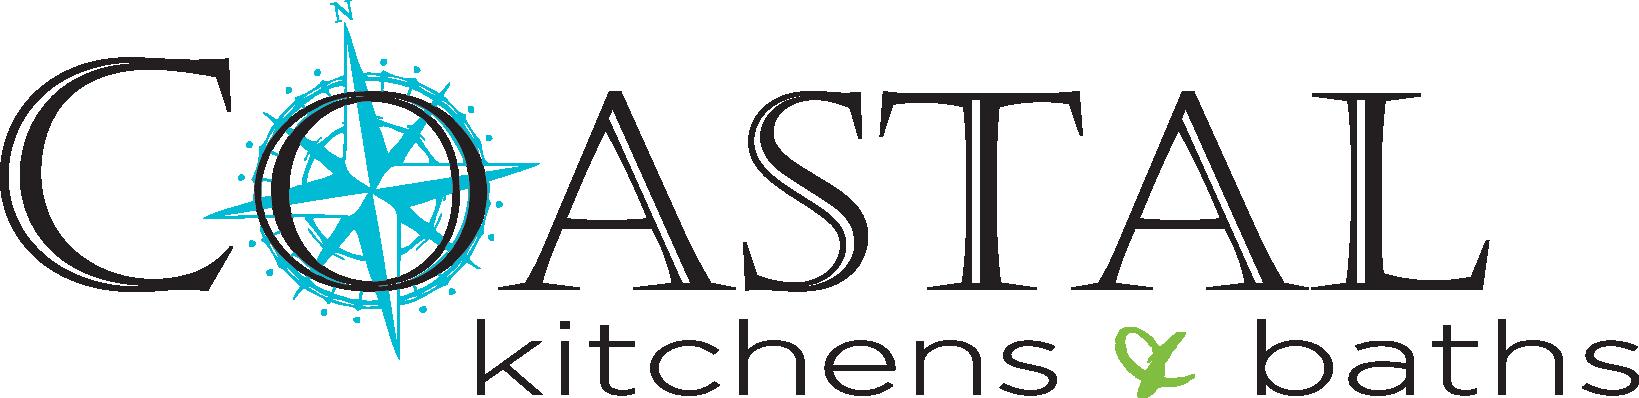 Coastal Kitchens Baths Professional Custom Kitchen Bathroom Design